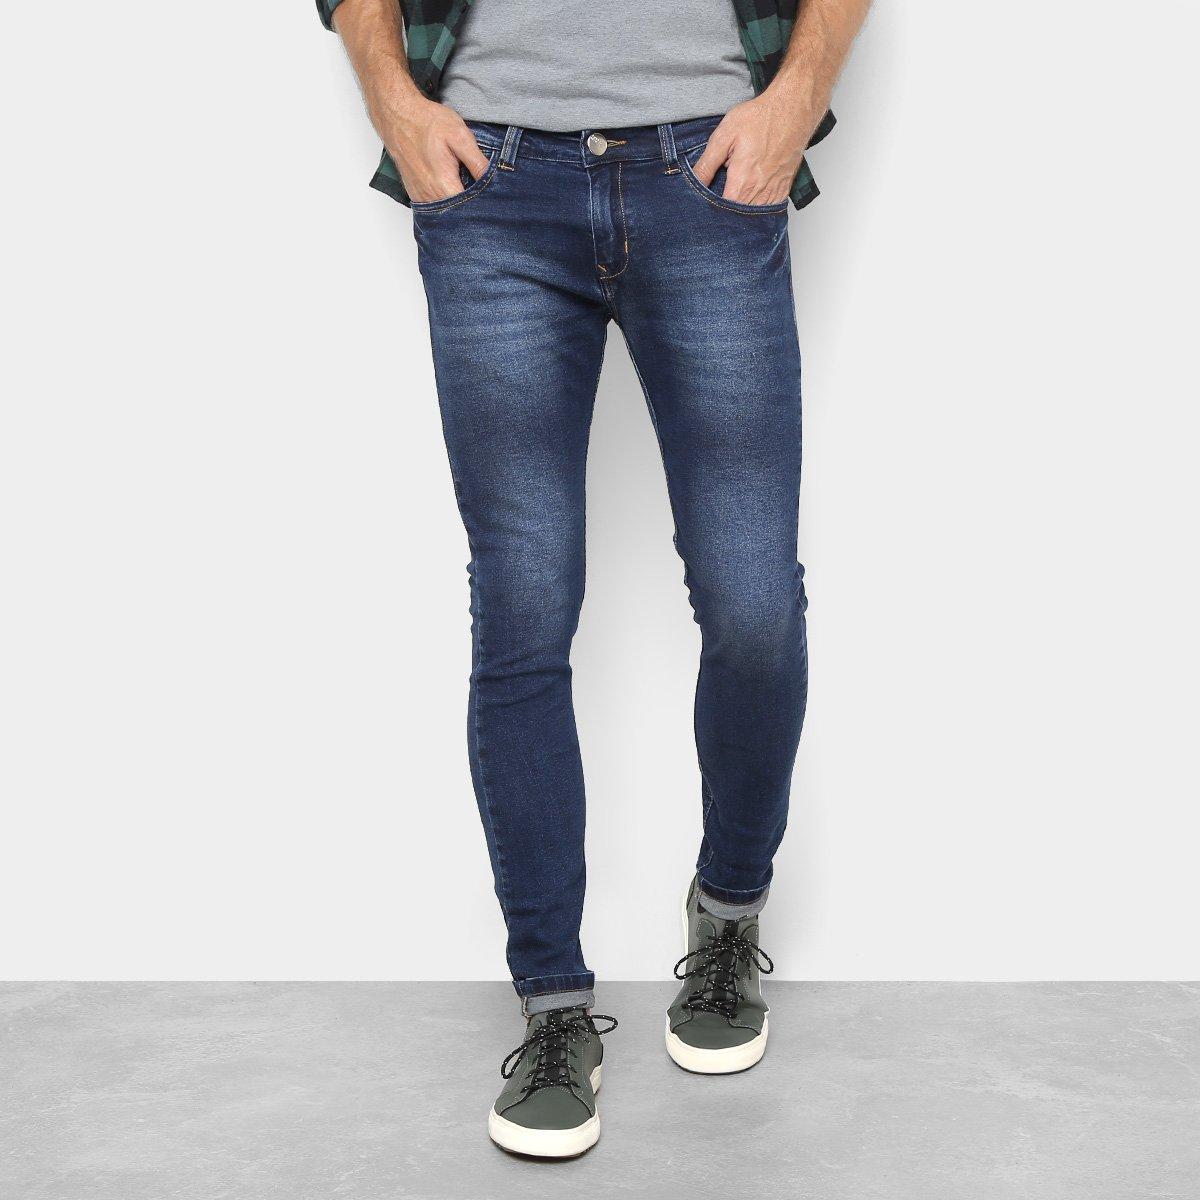 524d69102 Calça Jeans Preston Five Pockets Escura Masculina